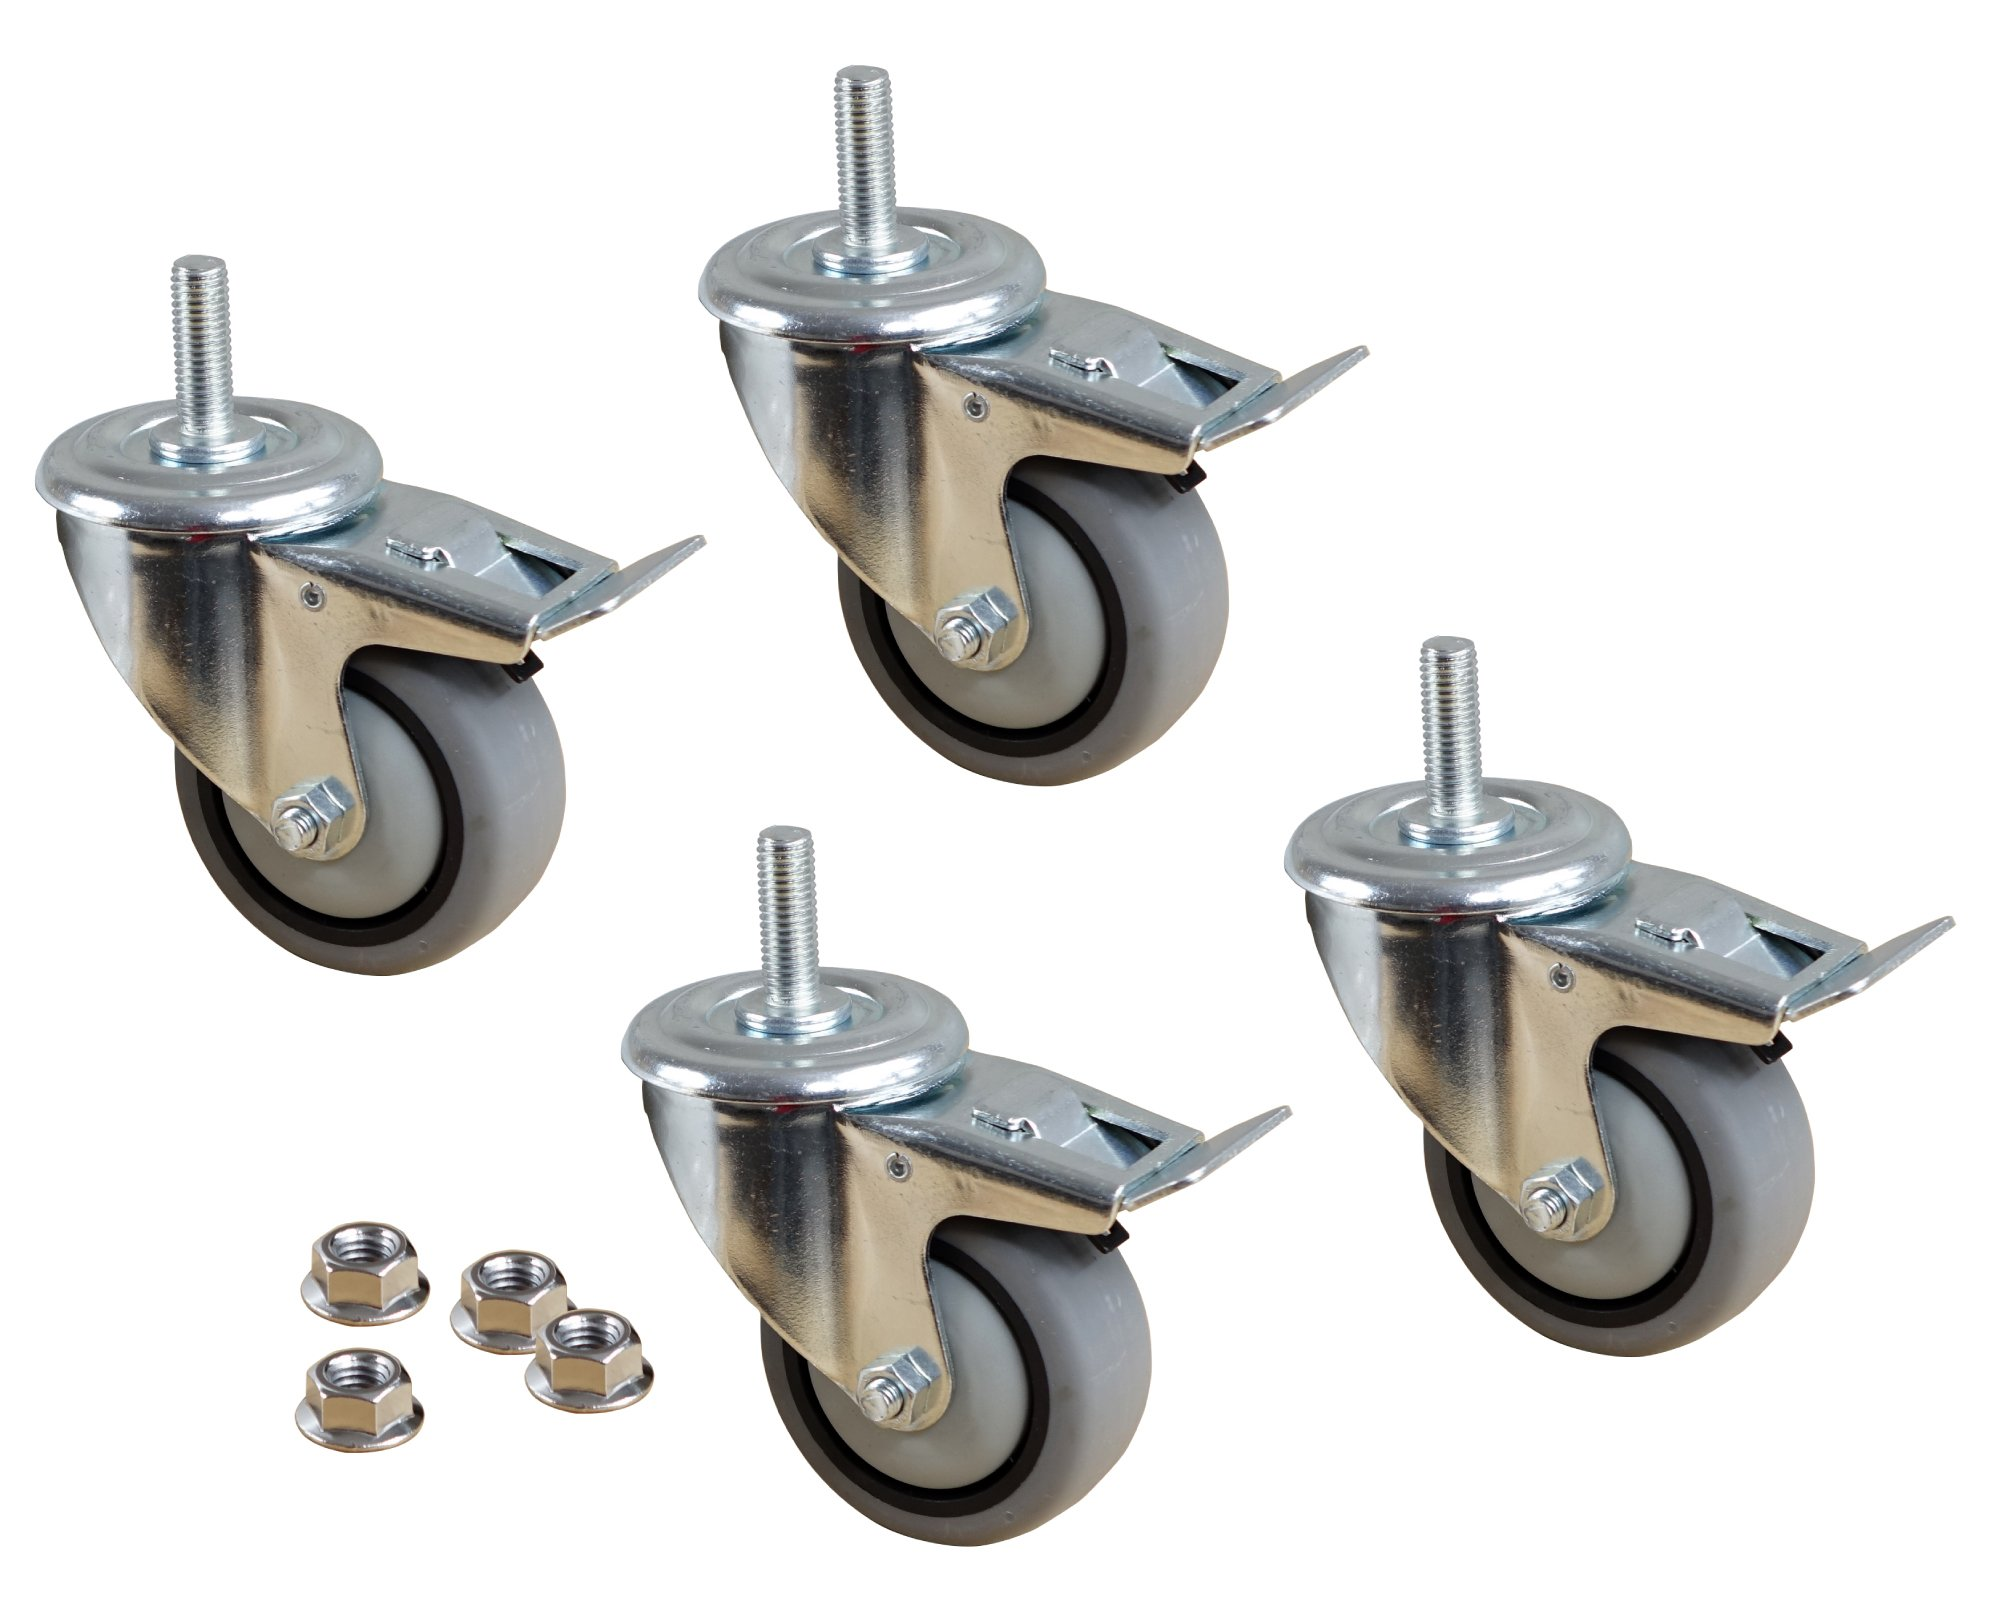 POWERTEC TPR Kit 17201 3'' Dual Locking Swivel Gray Thermoplastic Wheels Heavy Duty 150 Lbs Per Caster (Set of 4), 3-Inch by POWERTEC